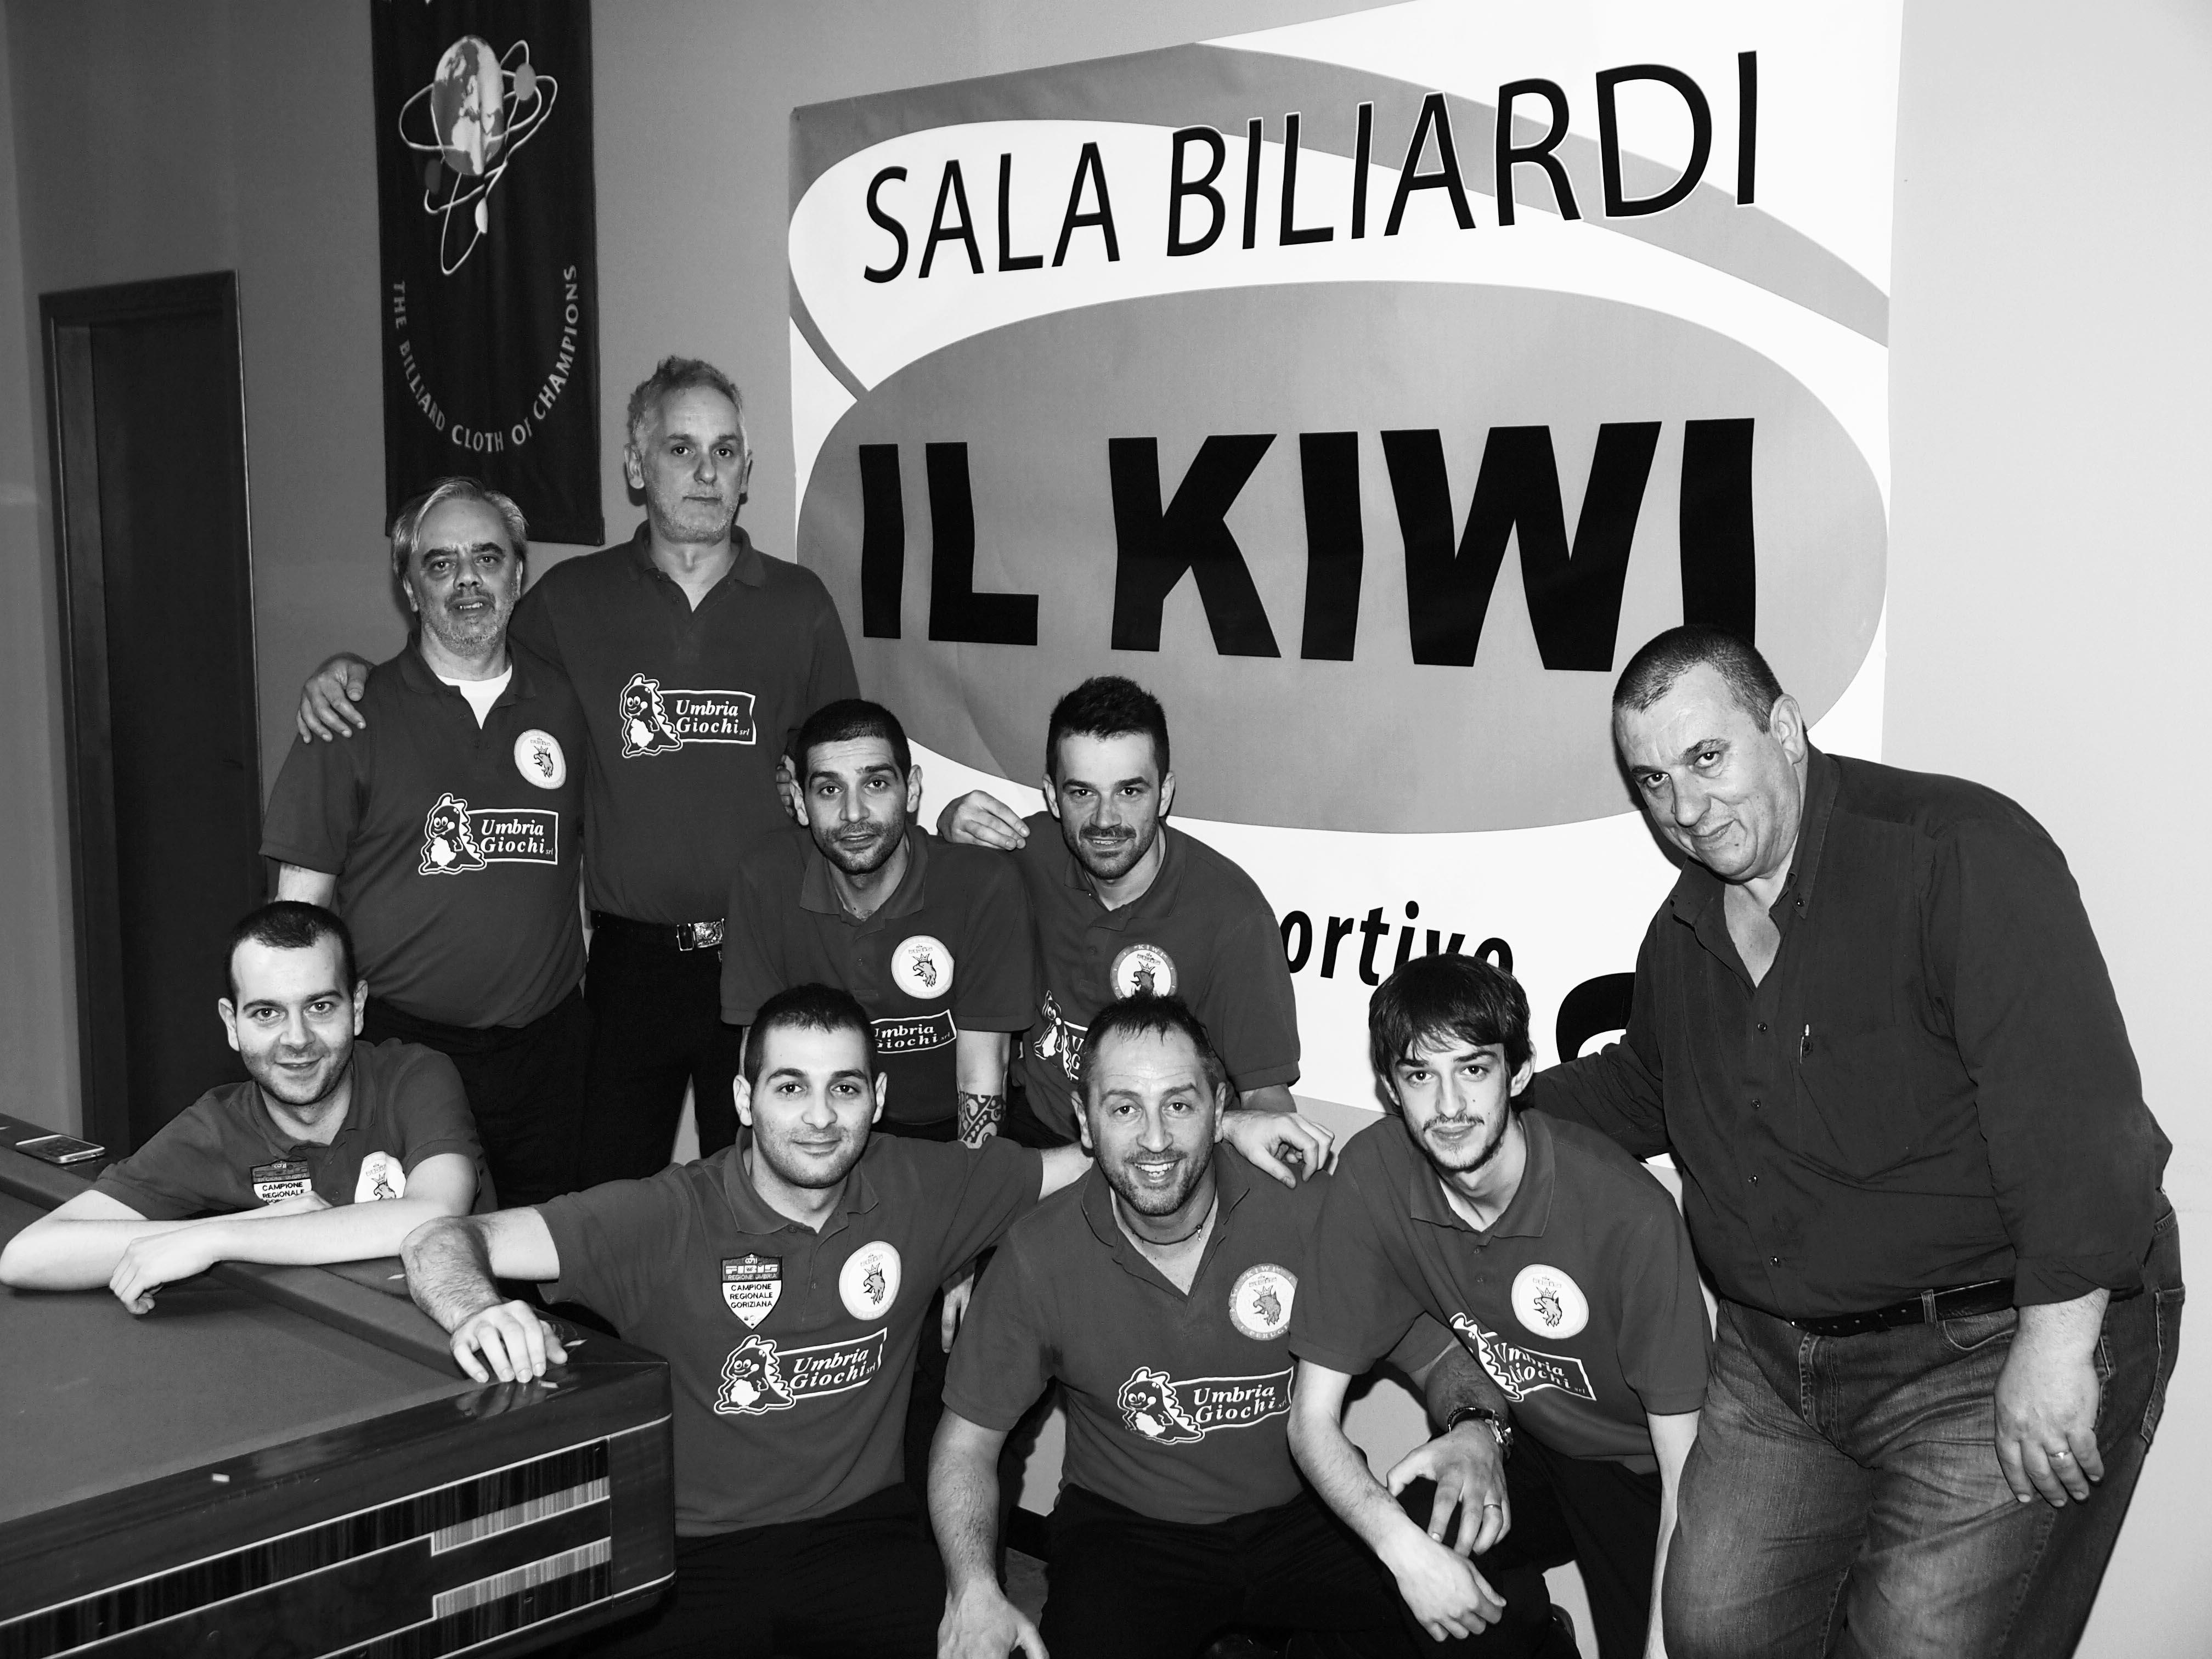 BILIARDO KIWI Campioni 2015 b.n. 2